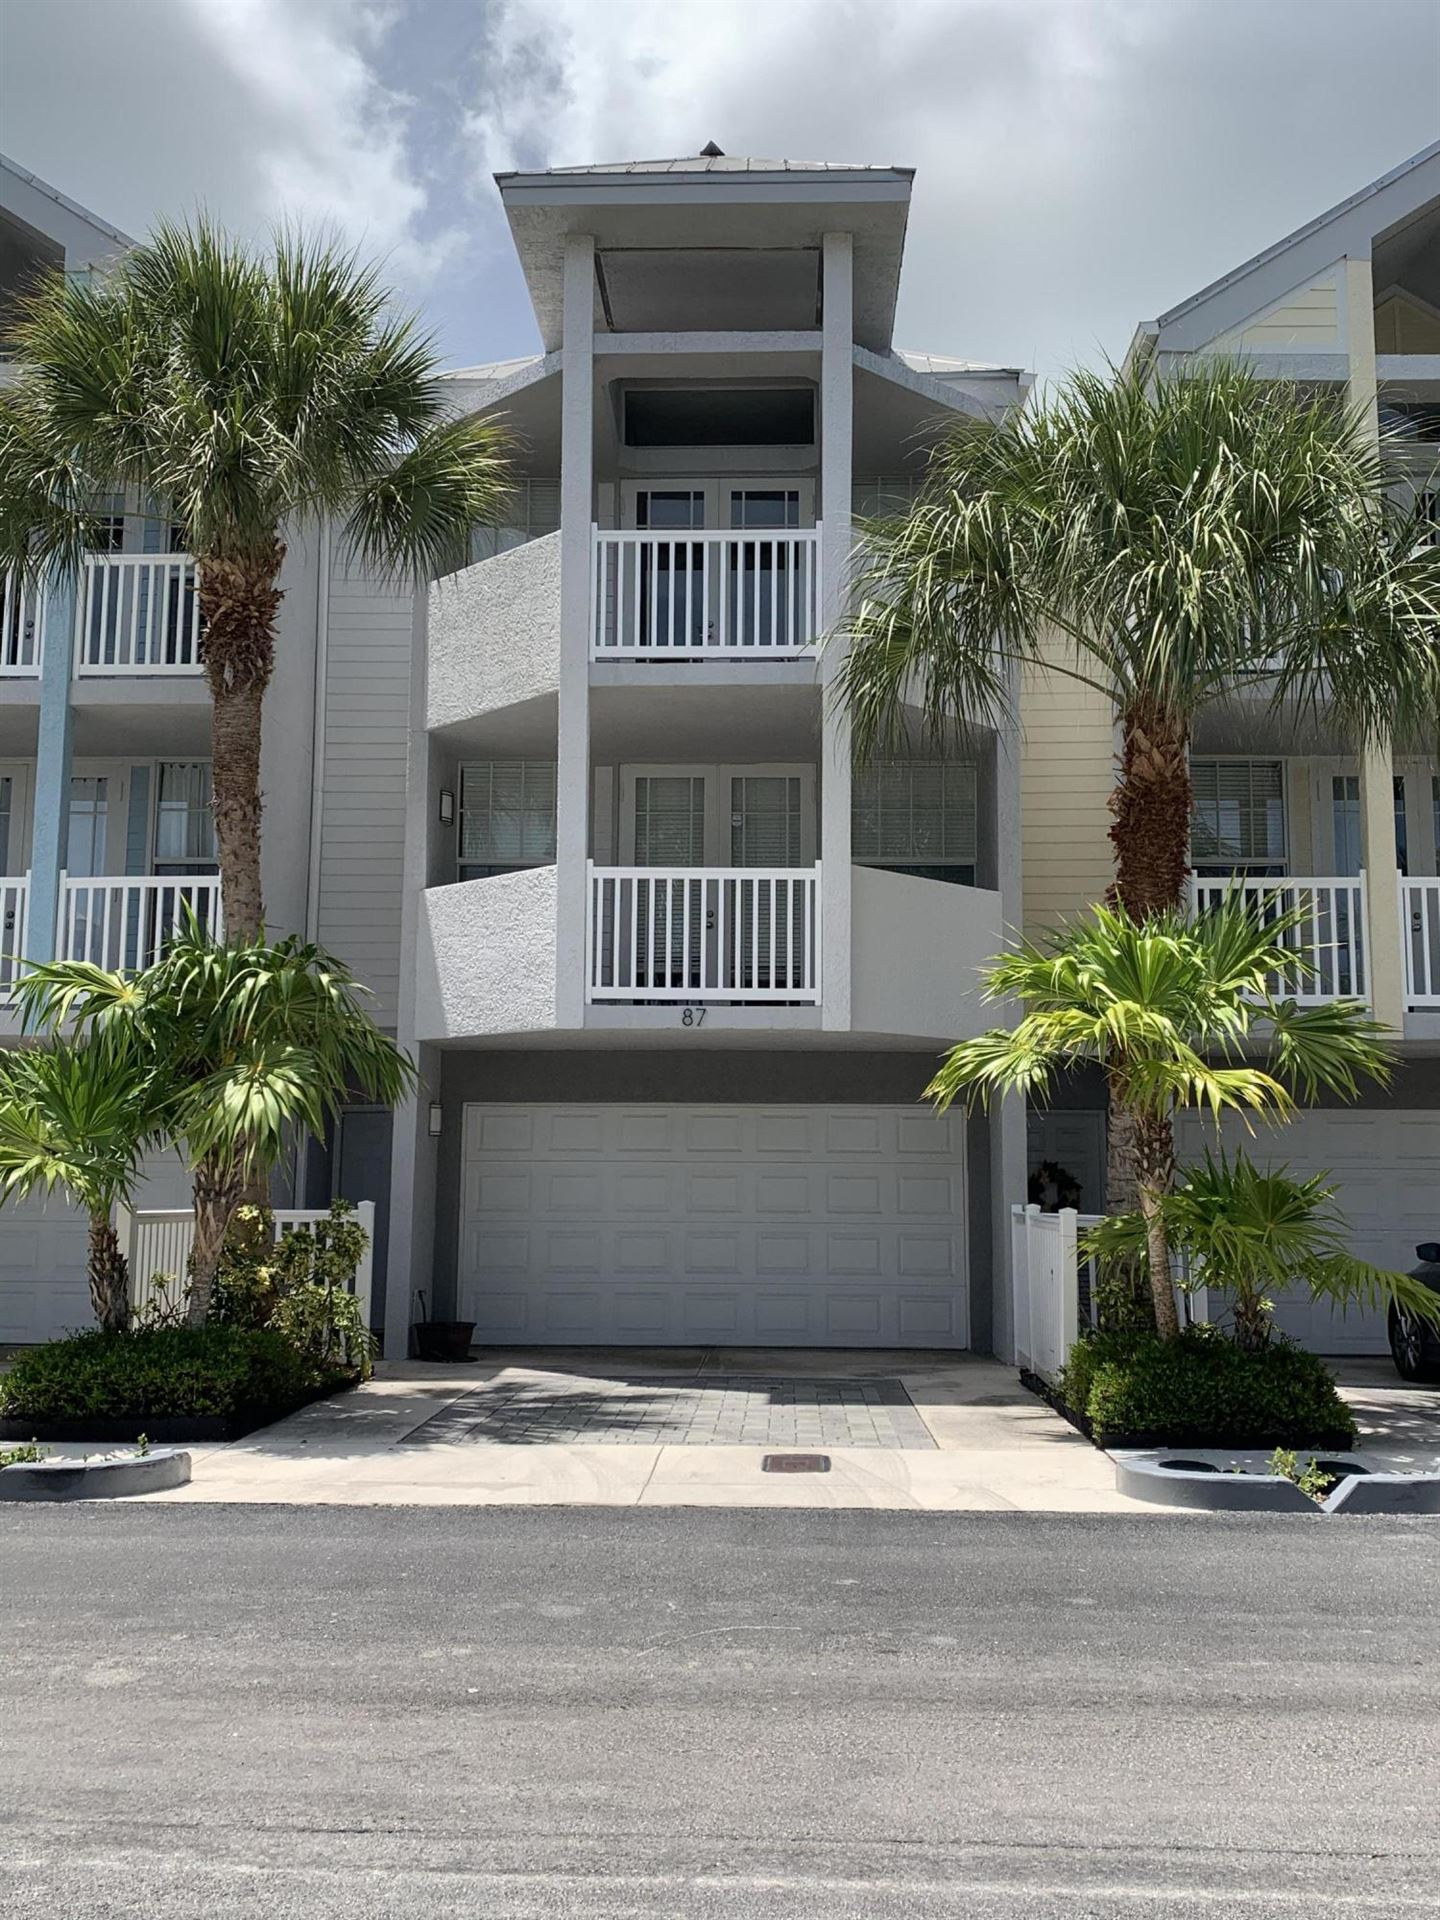 87 Seaside North Court, Key West, FL 33040 - #: 591492